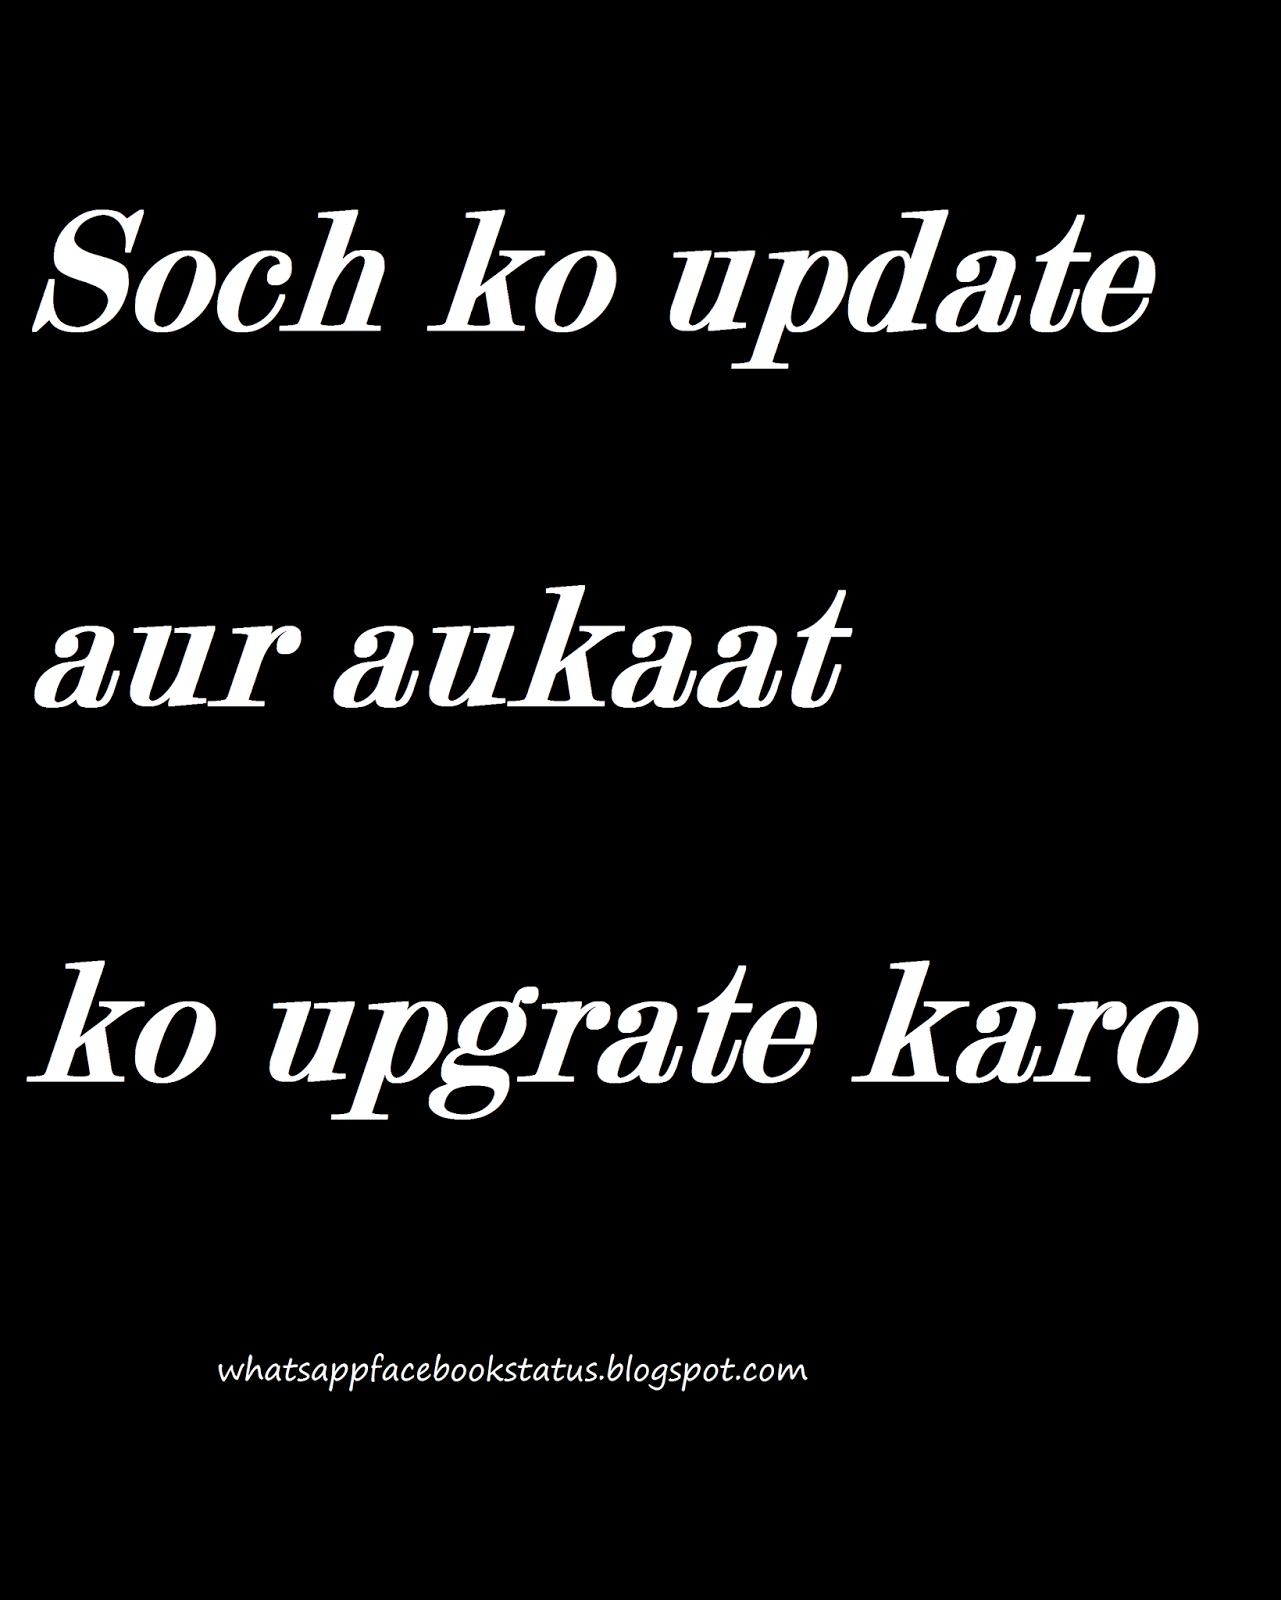 Single line attitude status for whatsapp